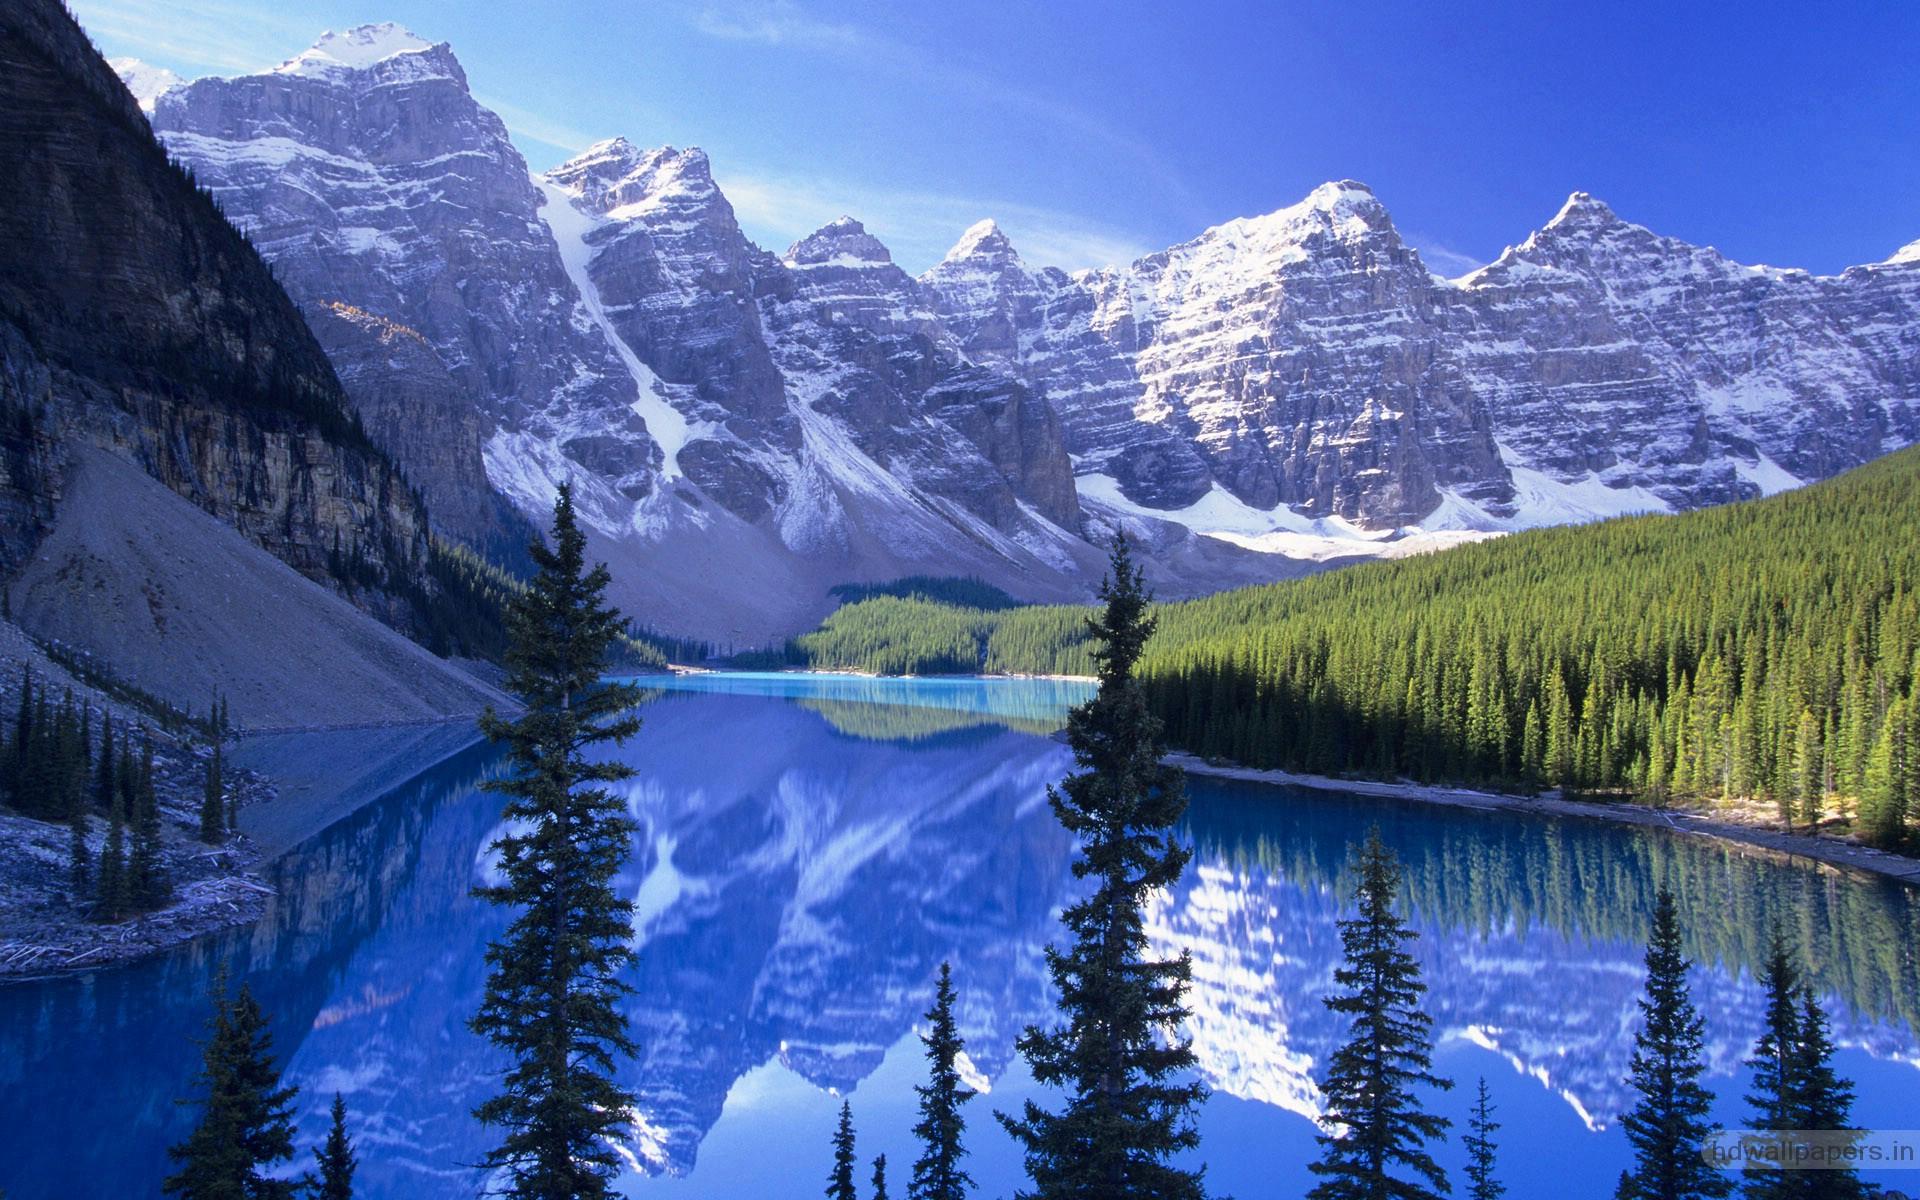 Alberta National Park Canada wallpaper